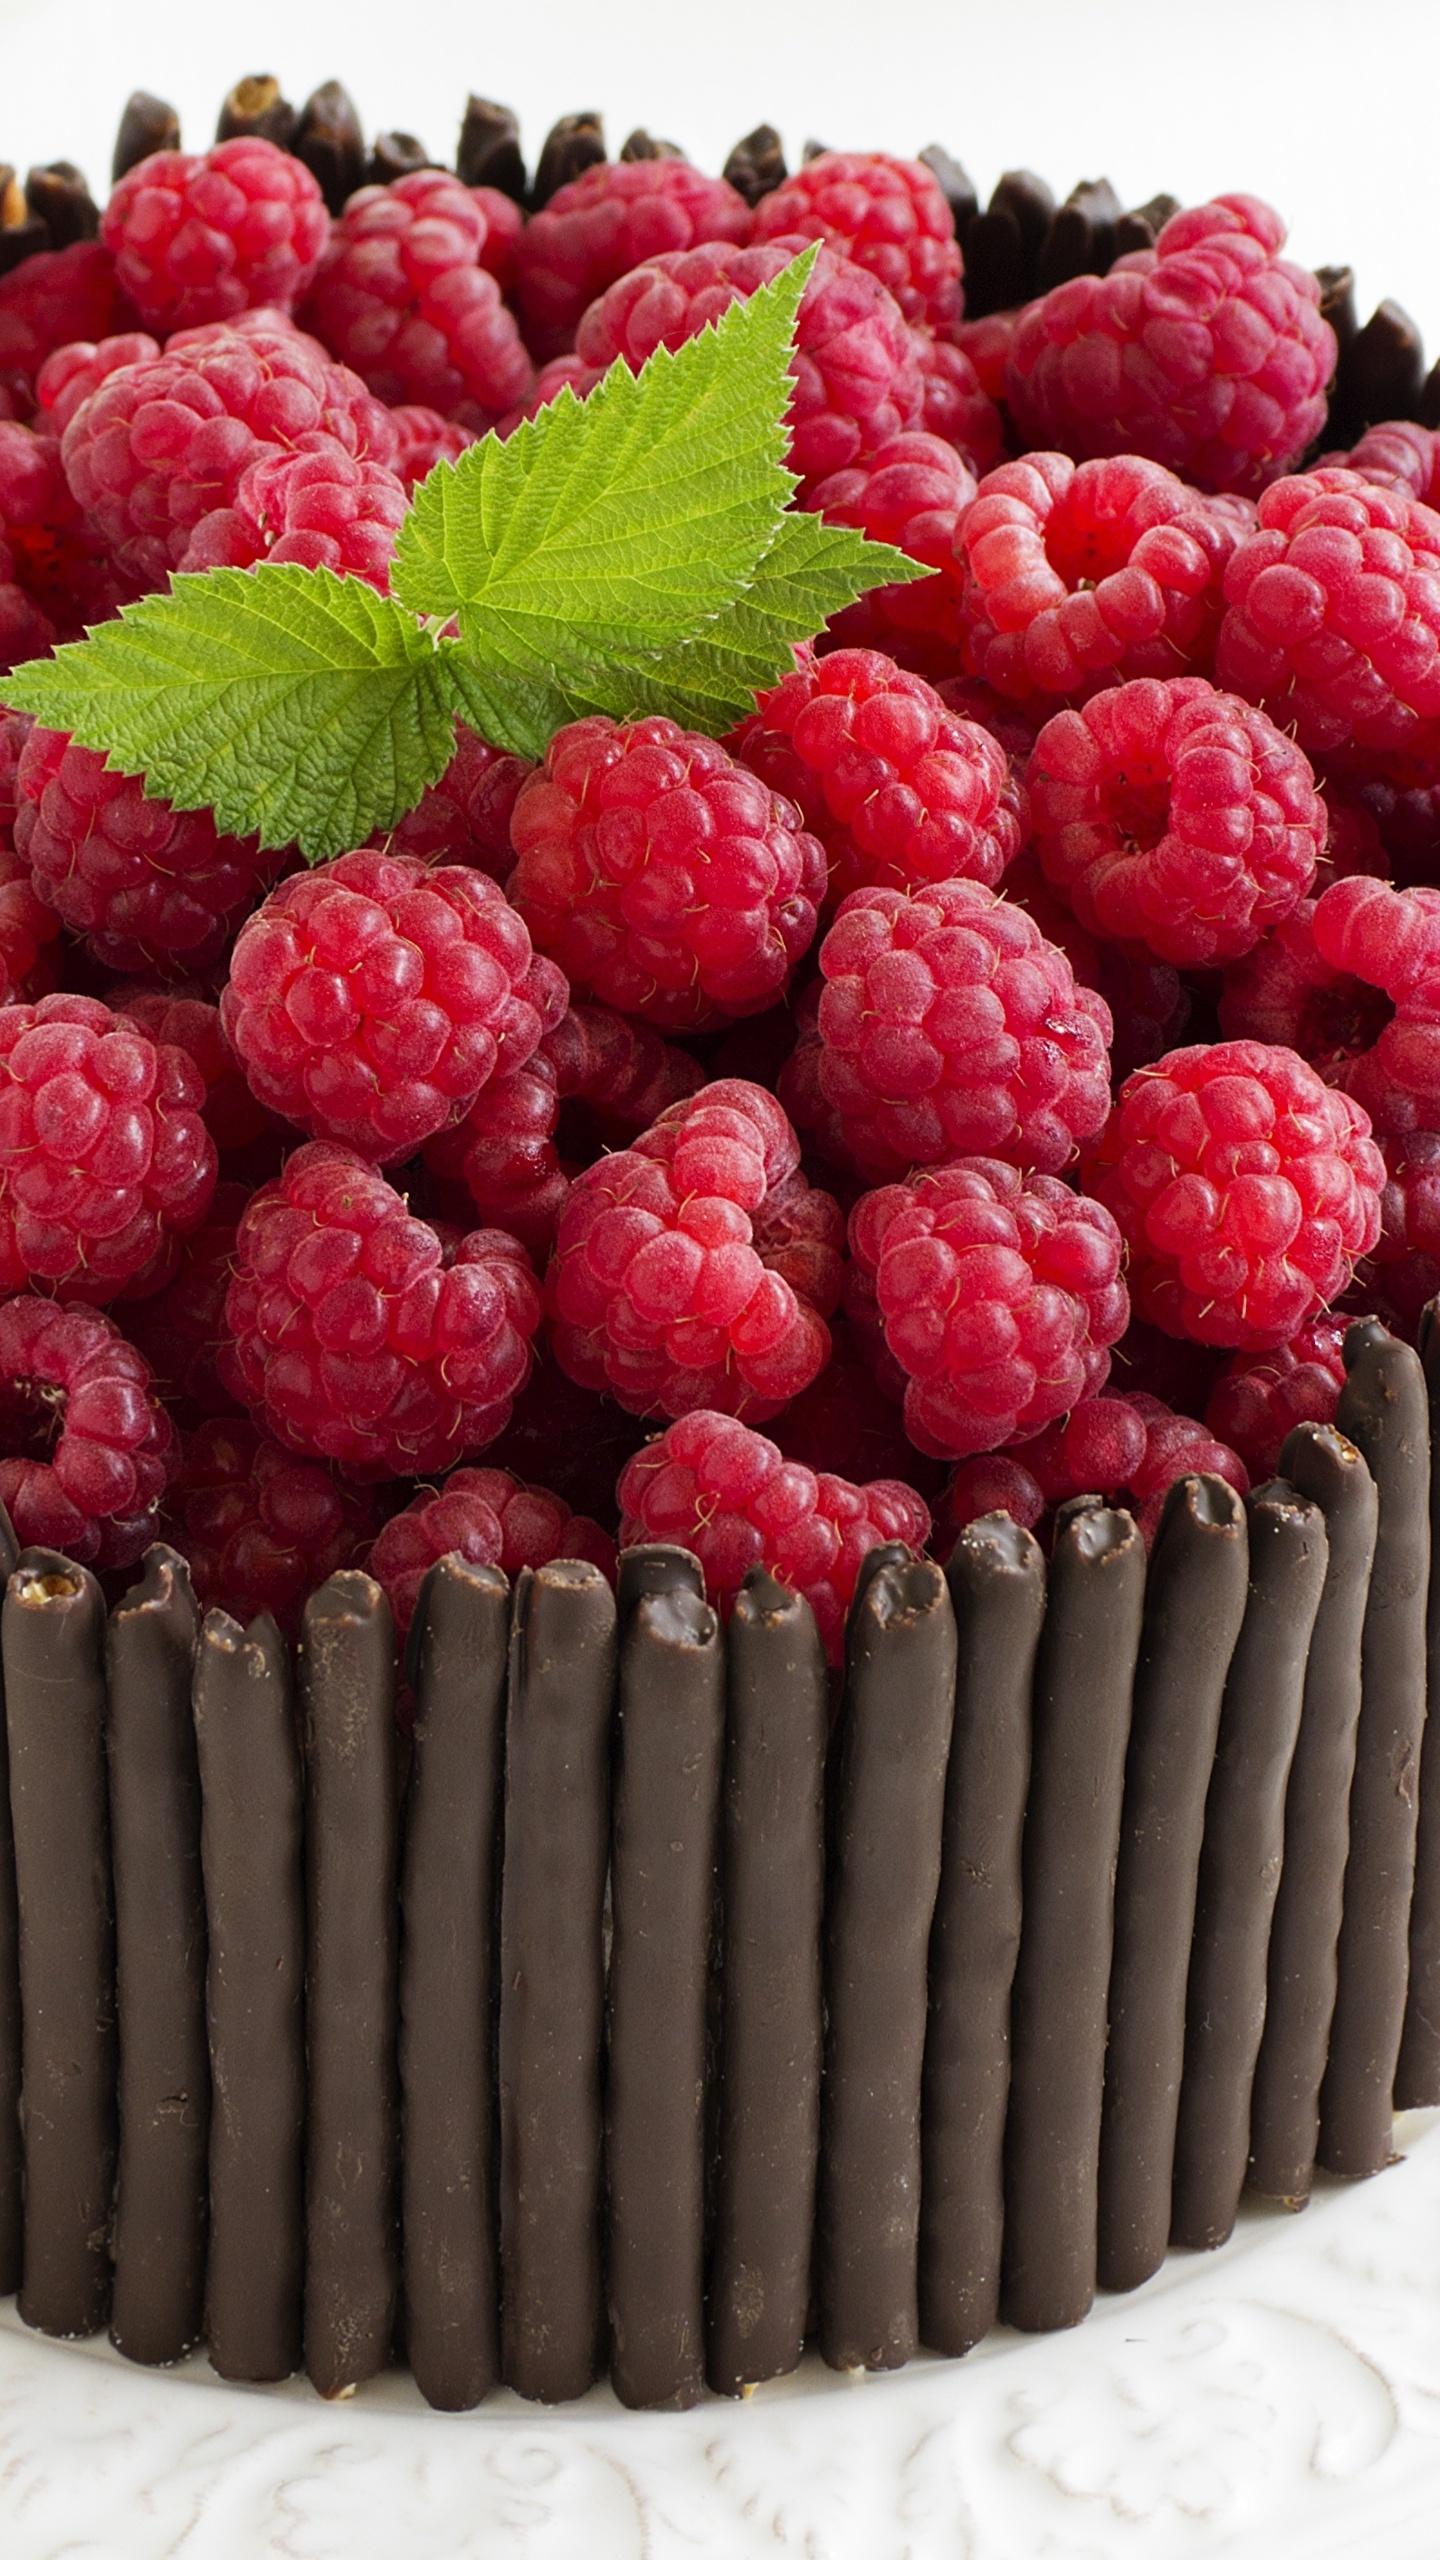 Обои Шоколад Торты Малина Пища 1440x2560 Еда Продукты питания